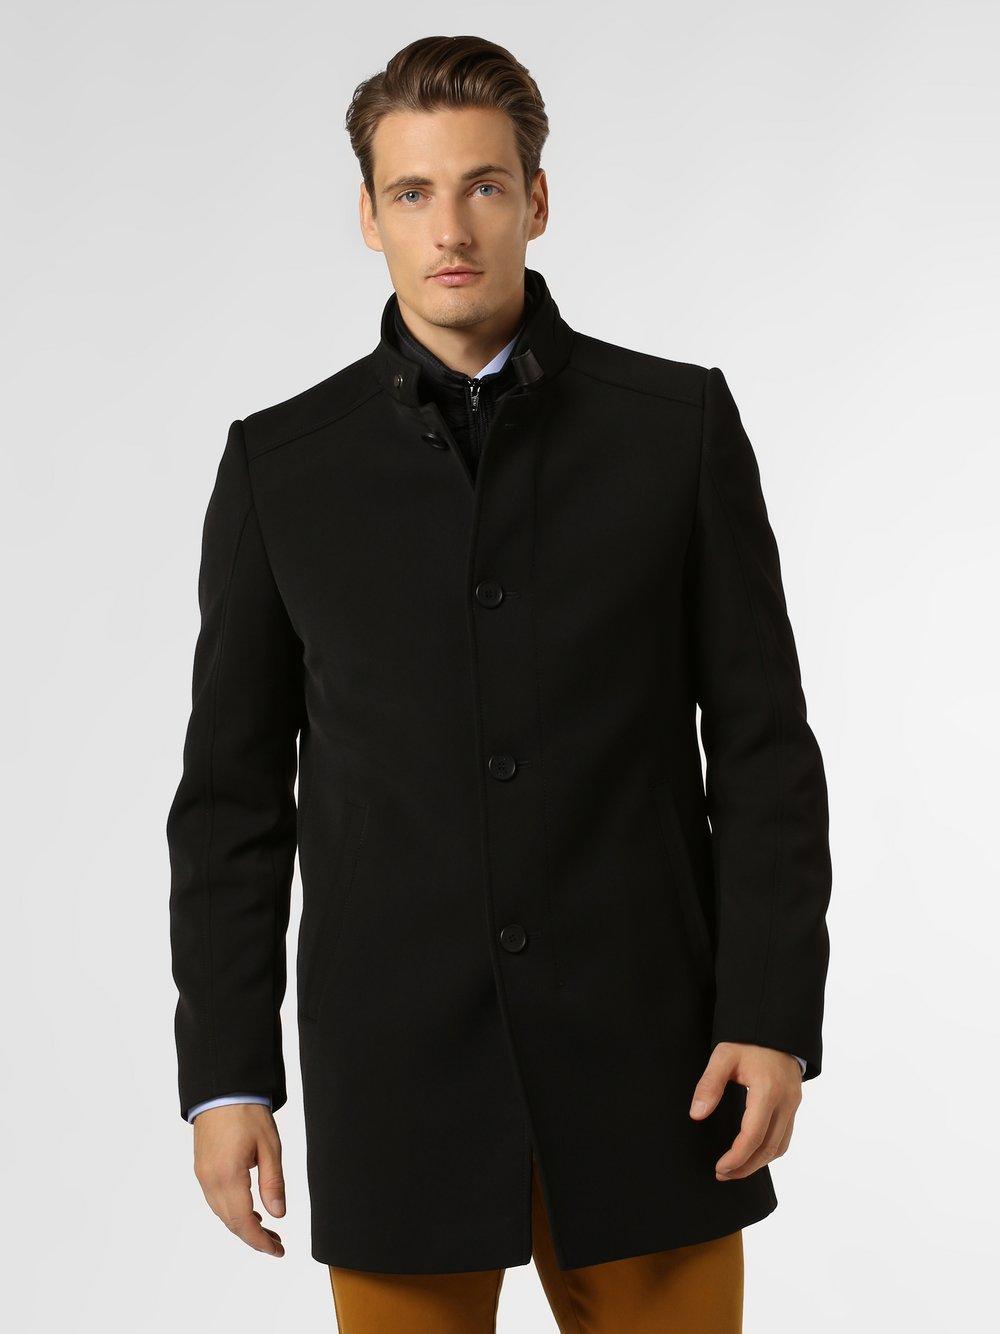 Cinque - Płaszcz męski – Ciliverpool, czarny